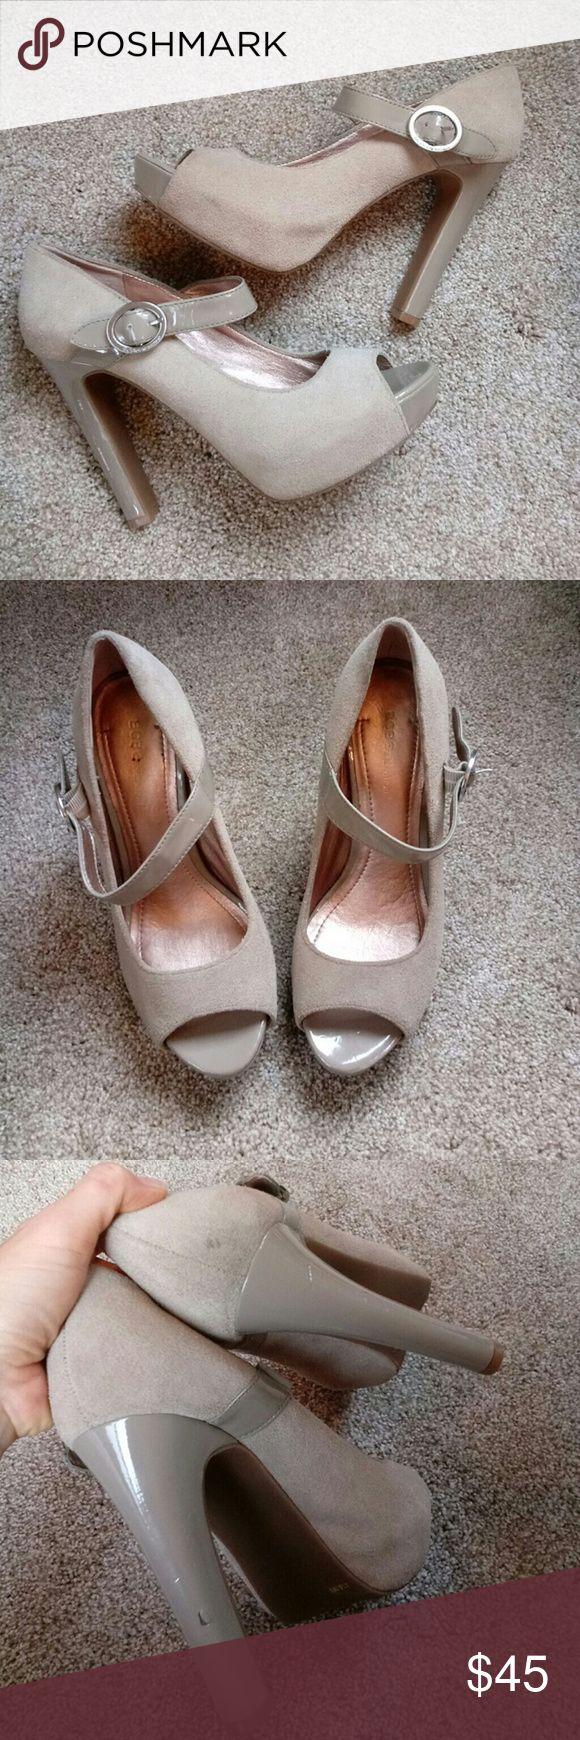 BCBGeneration Neutral High Heels BCBGeneration Neutral High Heels, brand new, a small scuff on heel. BCBGeneration Shoes Heels